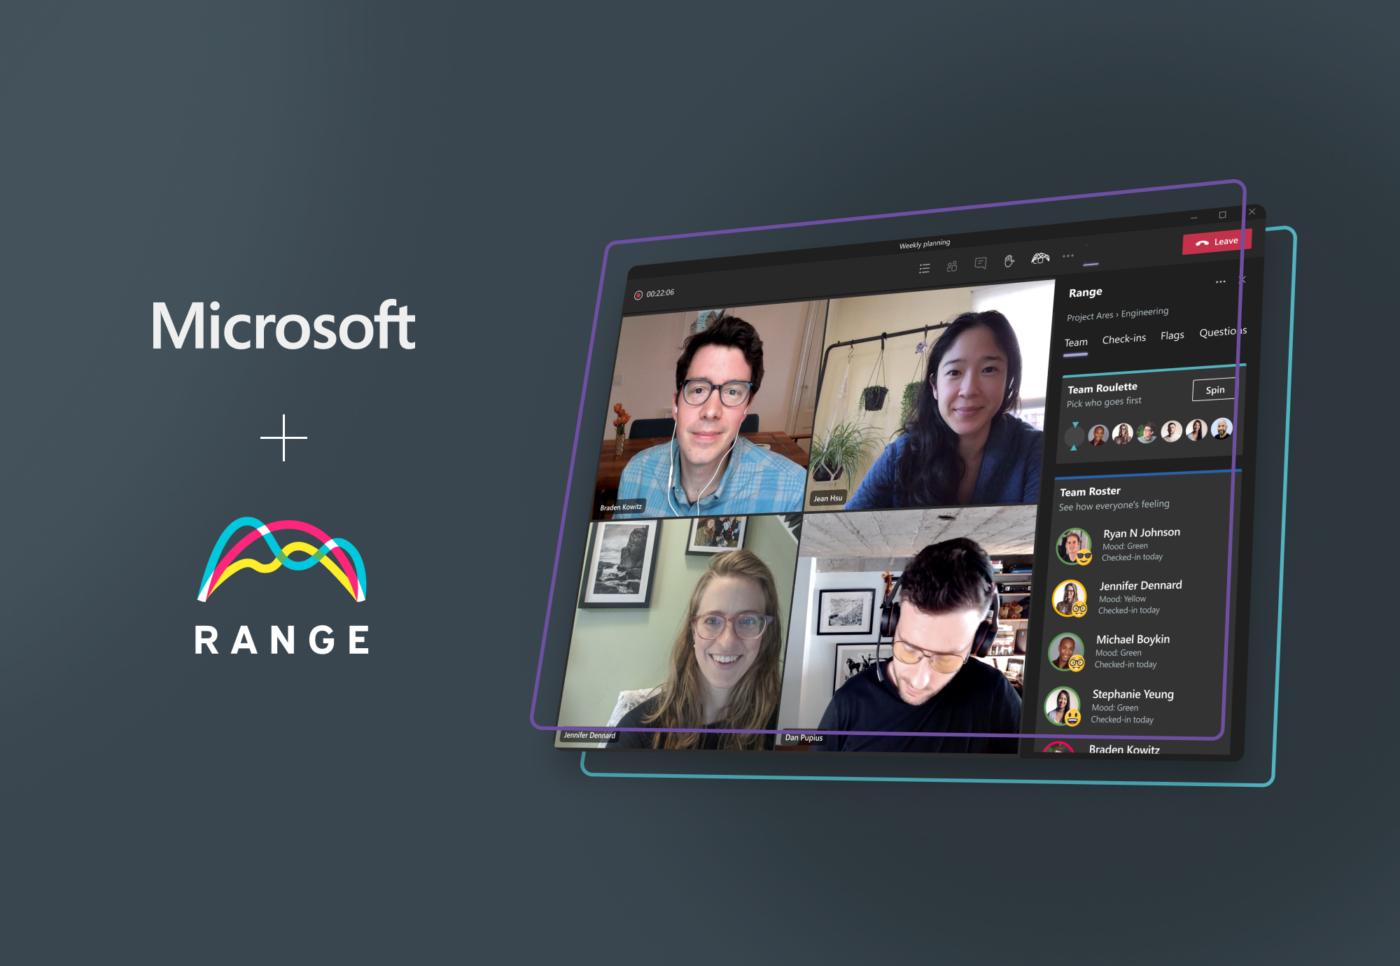 Microsoft Teams Range